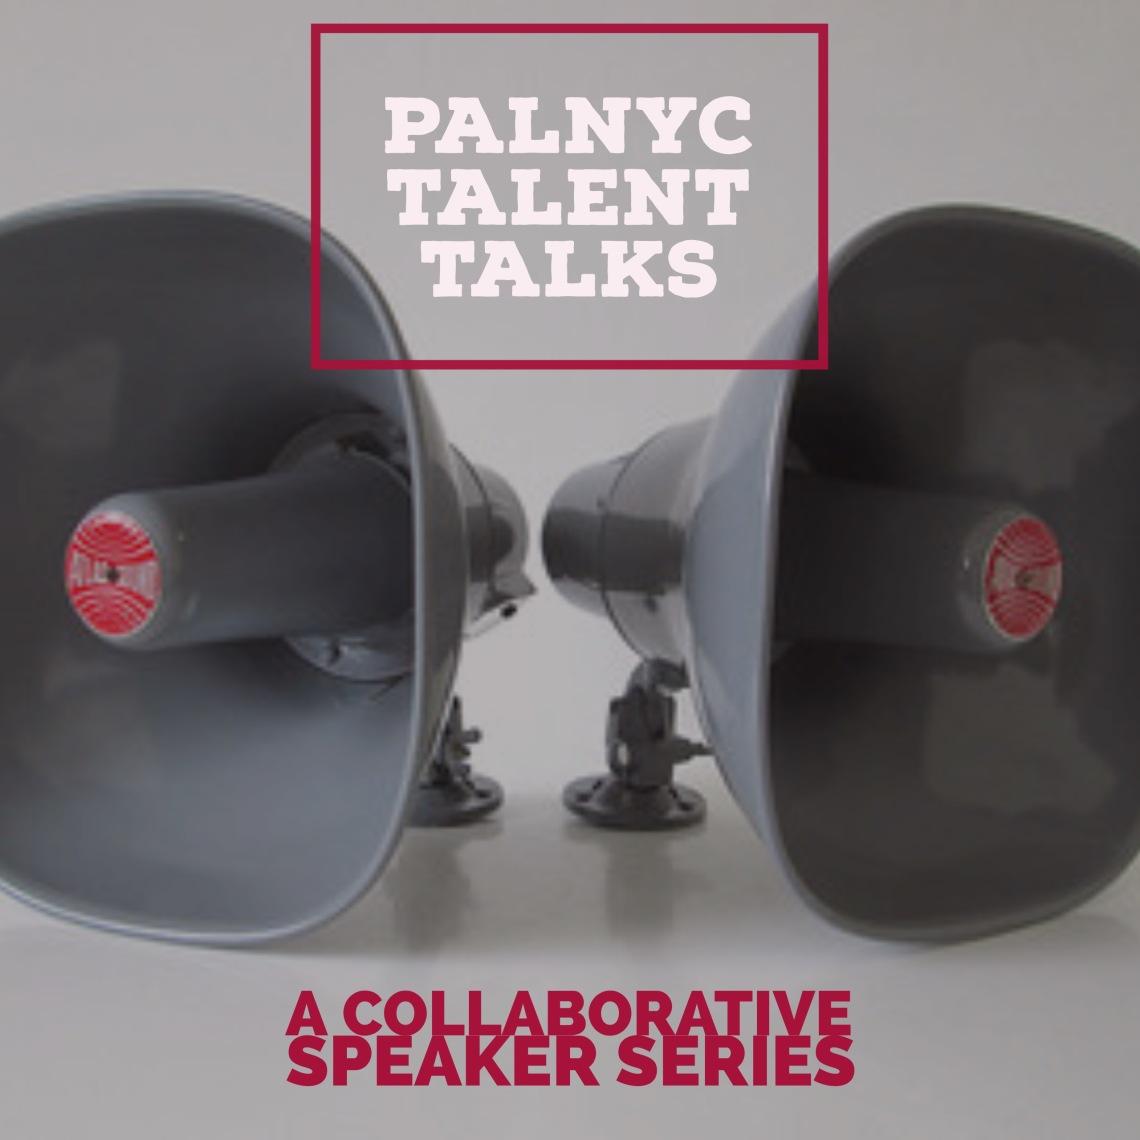 PALNYC_TALENTTALKS